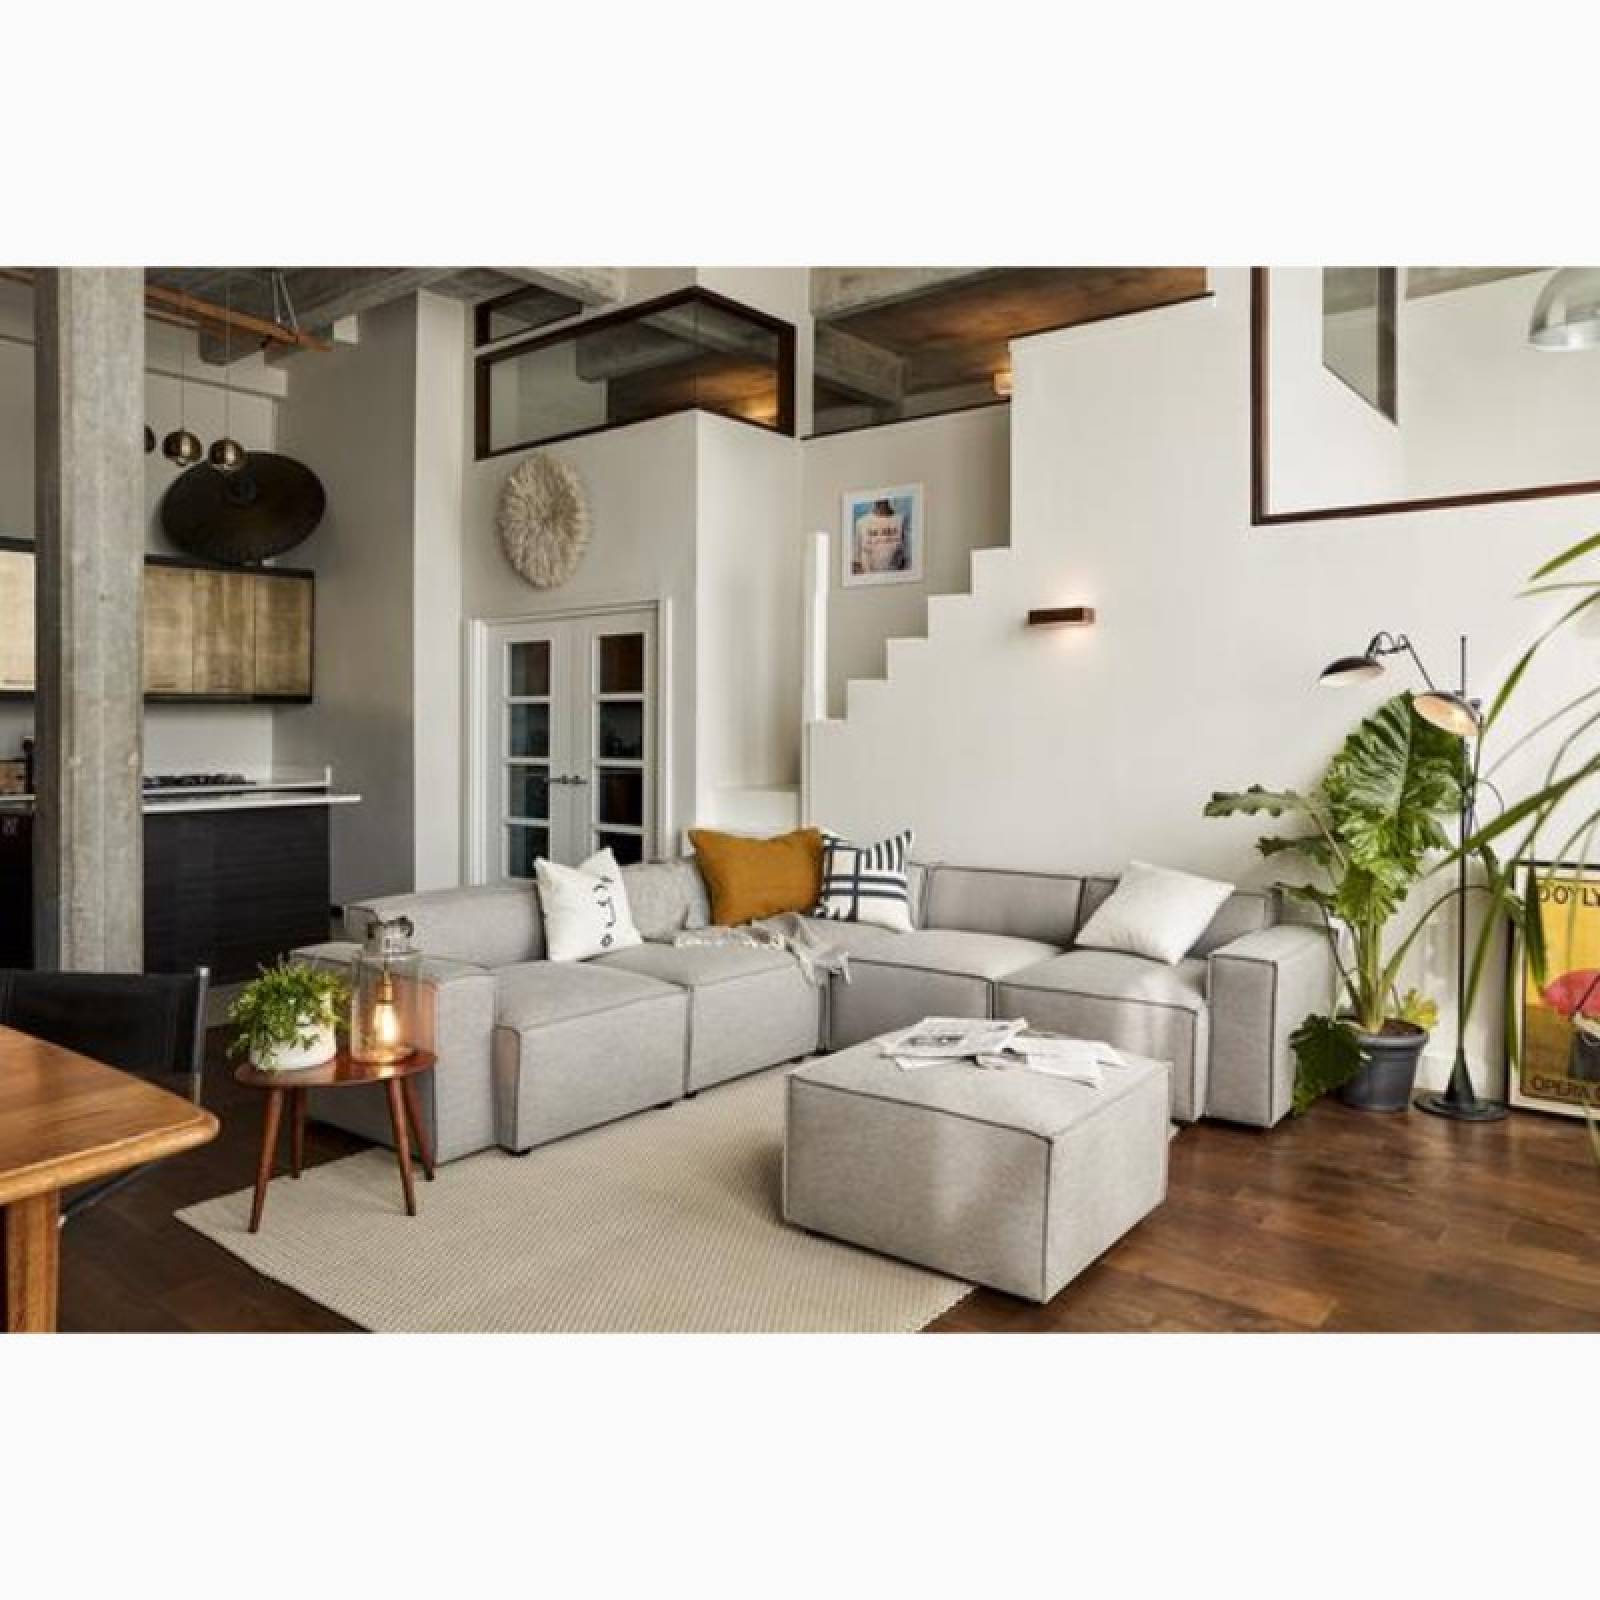 Swyft - Model 03 - Corner Sofa With Ottoman - Linen Shadow thumbnails